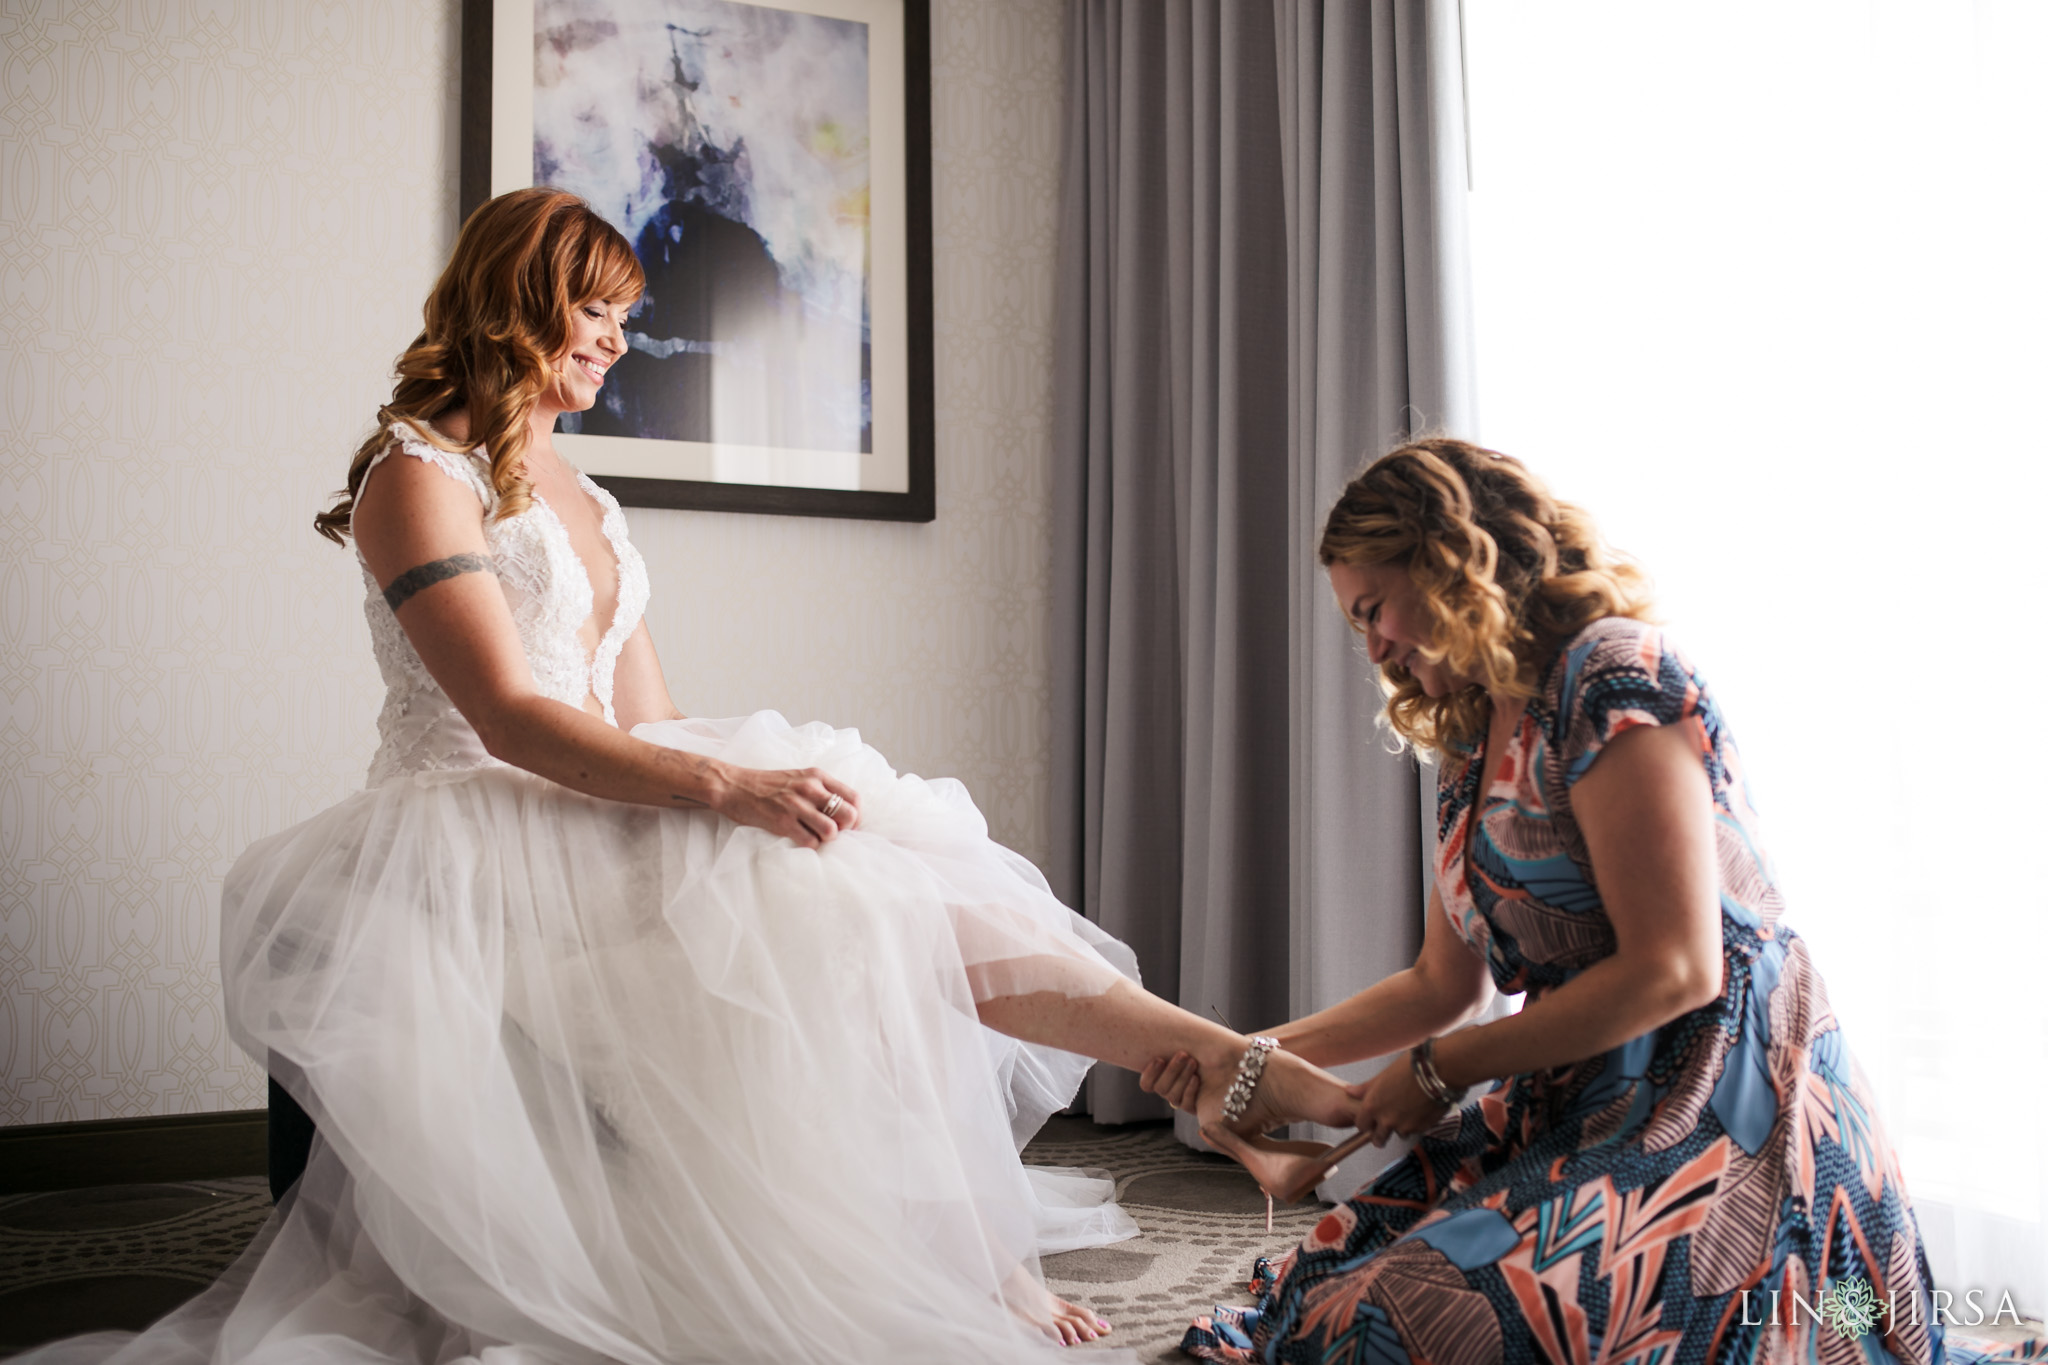 003 marina del rey hotel wedding photography